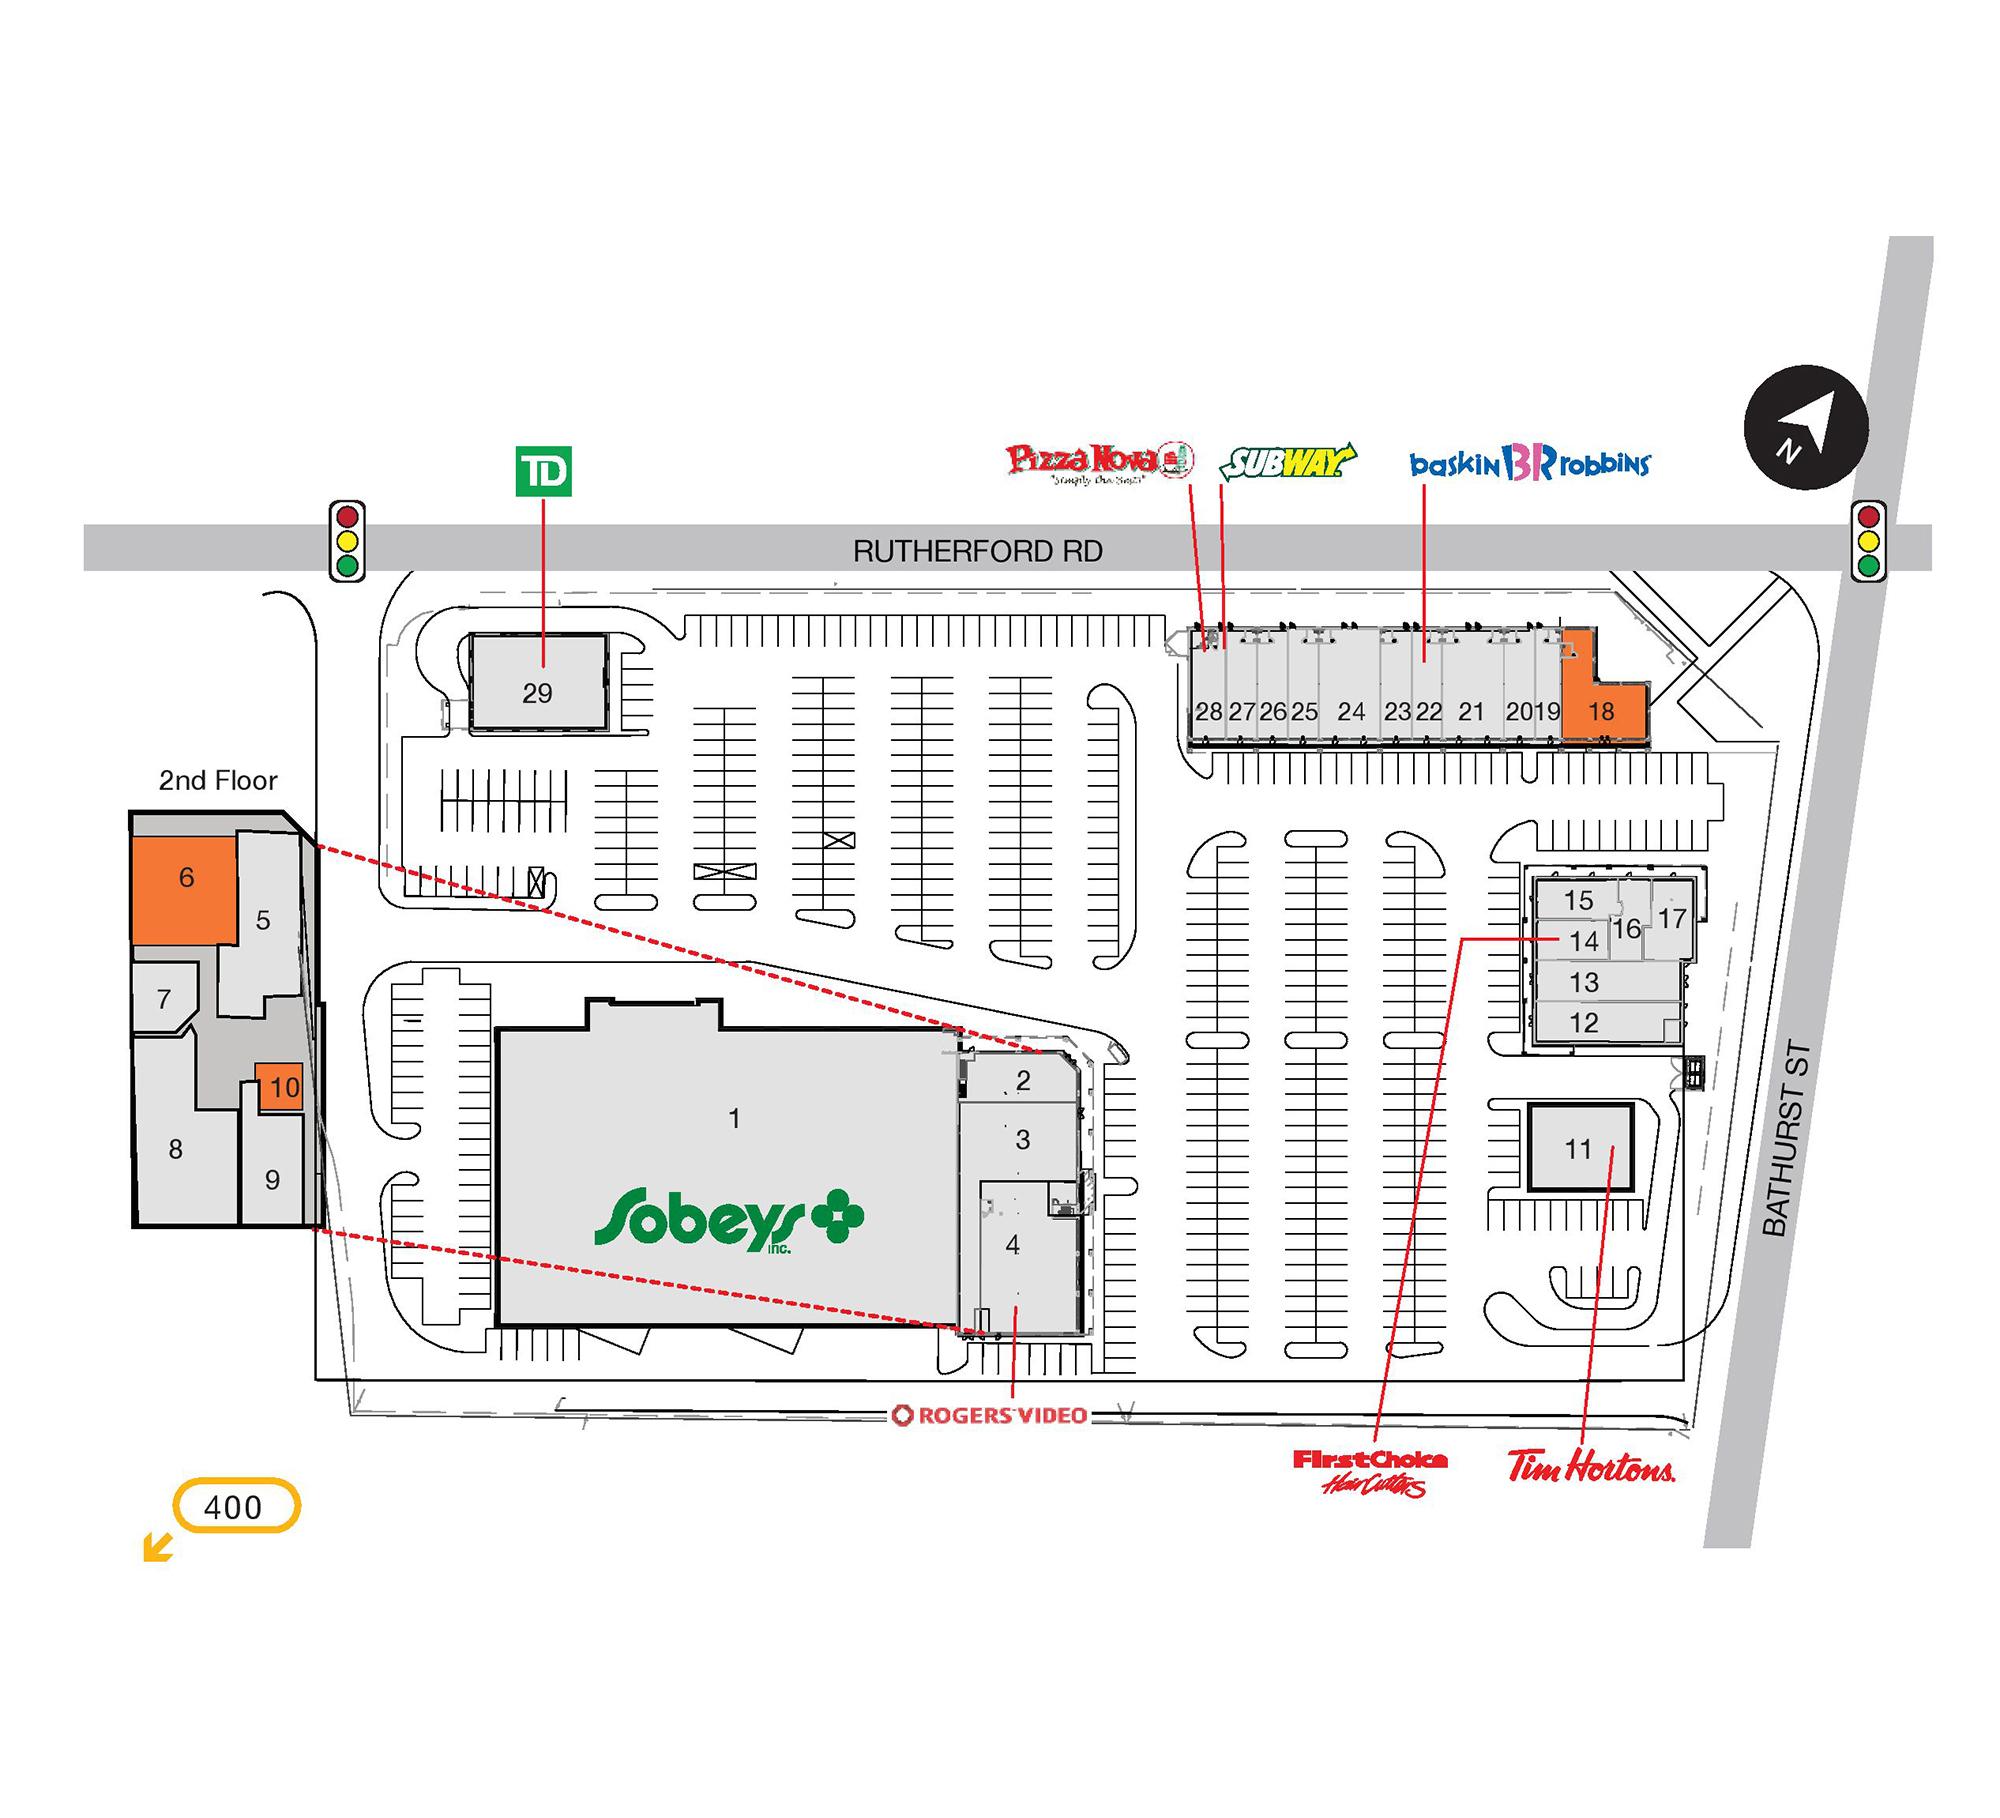 SmartCentres Vaughan in Vaughan Ontario 6 stores location